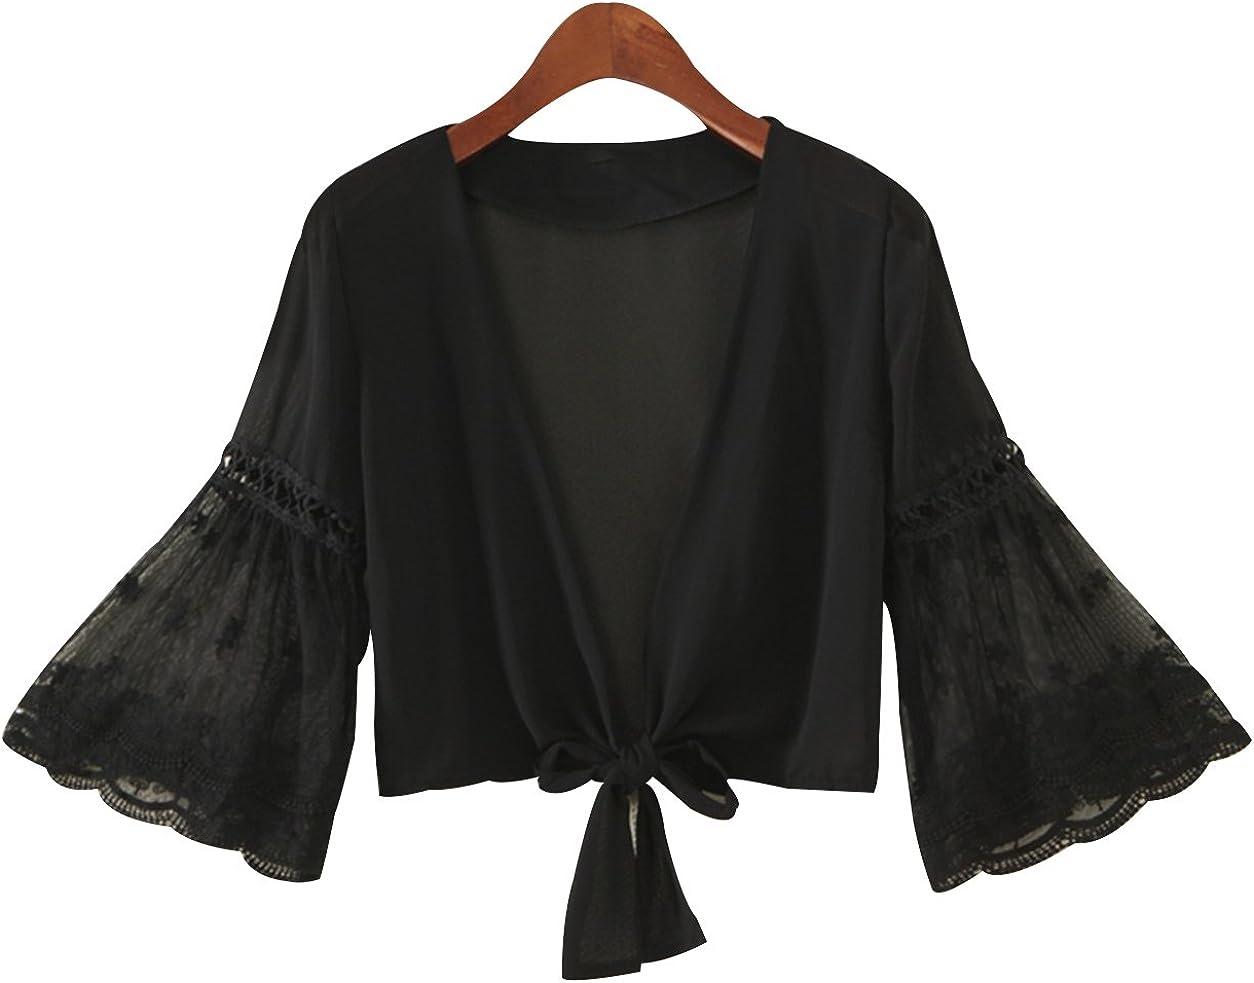 Trendy XU Women/Girl Summer Long Flare Sleeve Solid Open Cardigan Tied Crop Sunscreen Shrug Bolero